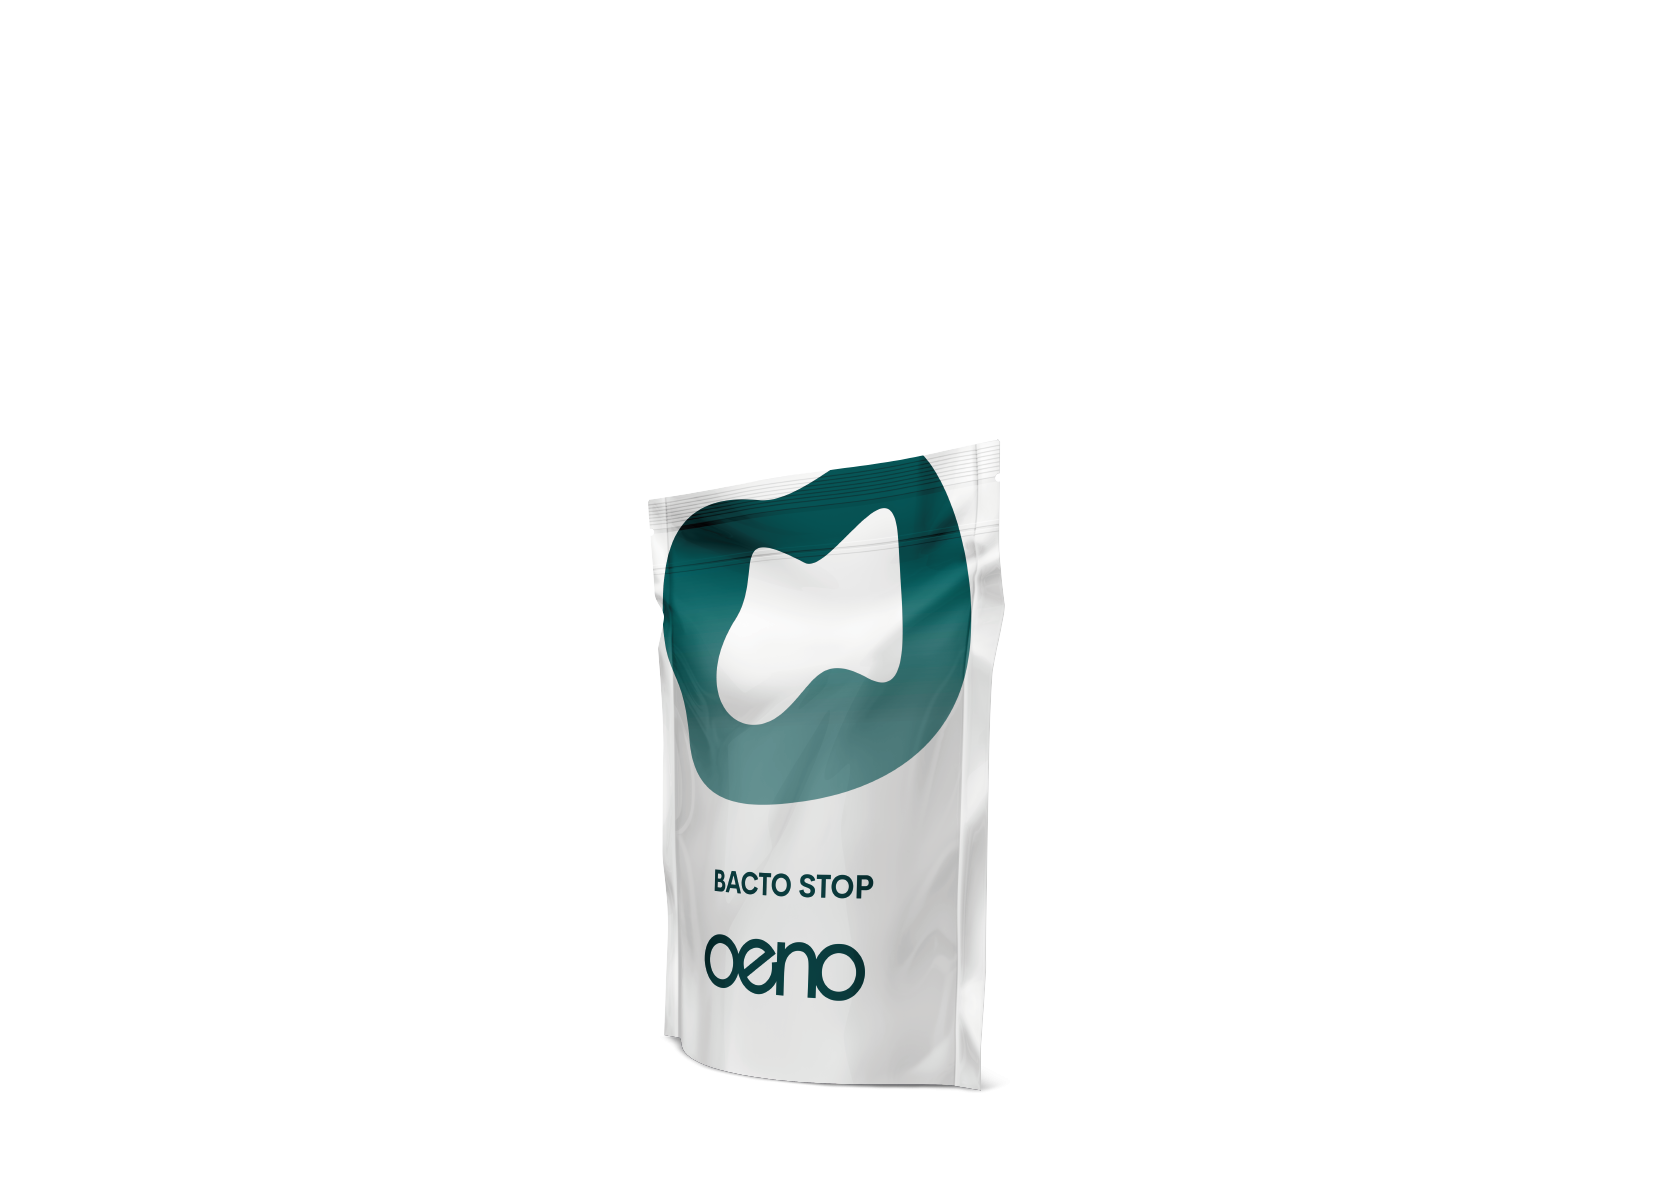 Bacto Stop oeno